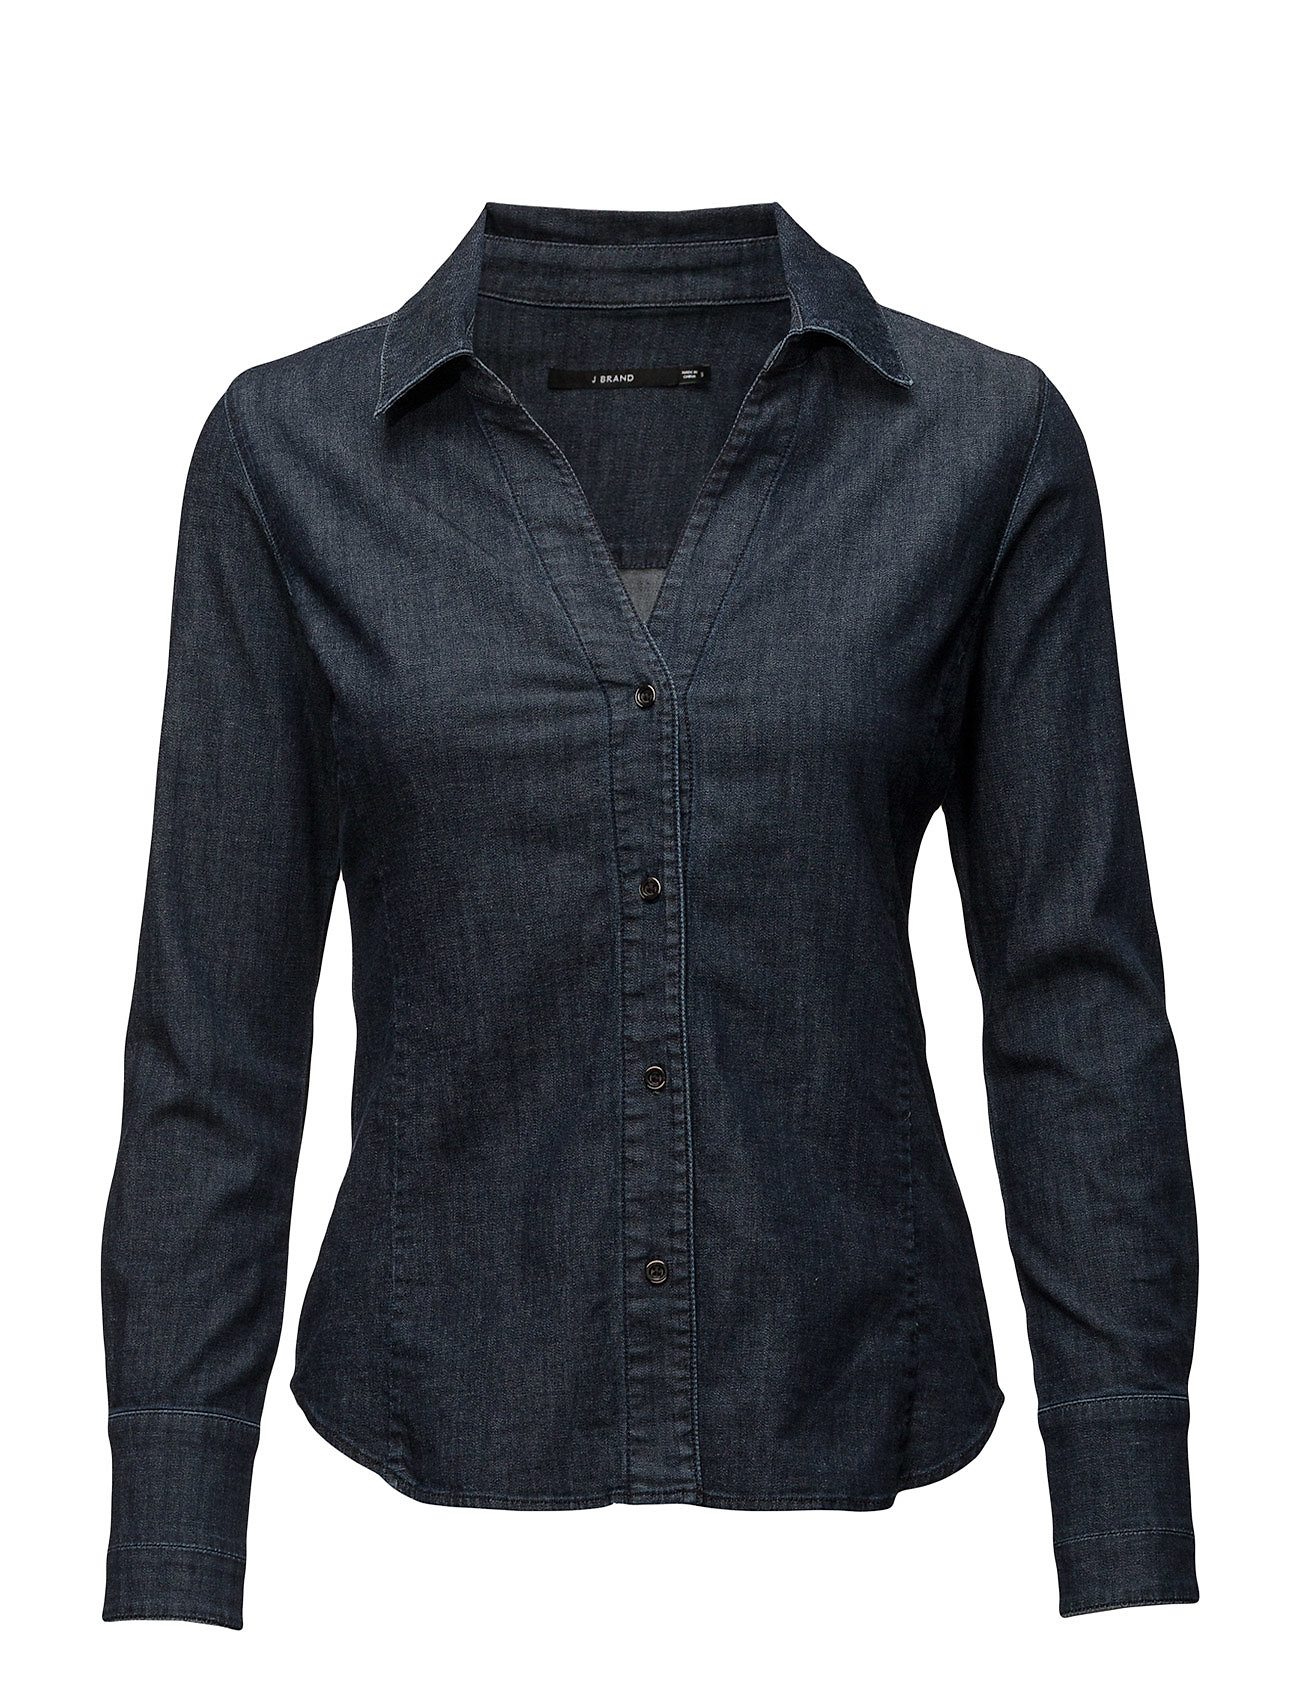 j brand B030 adina shirt på boozt.com dk